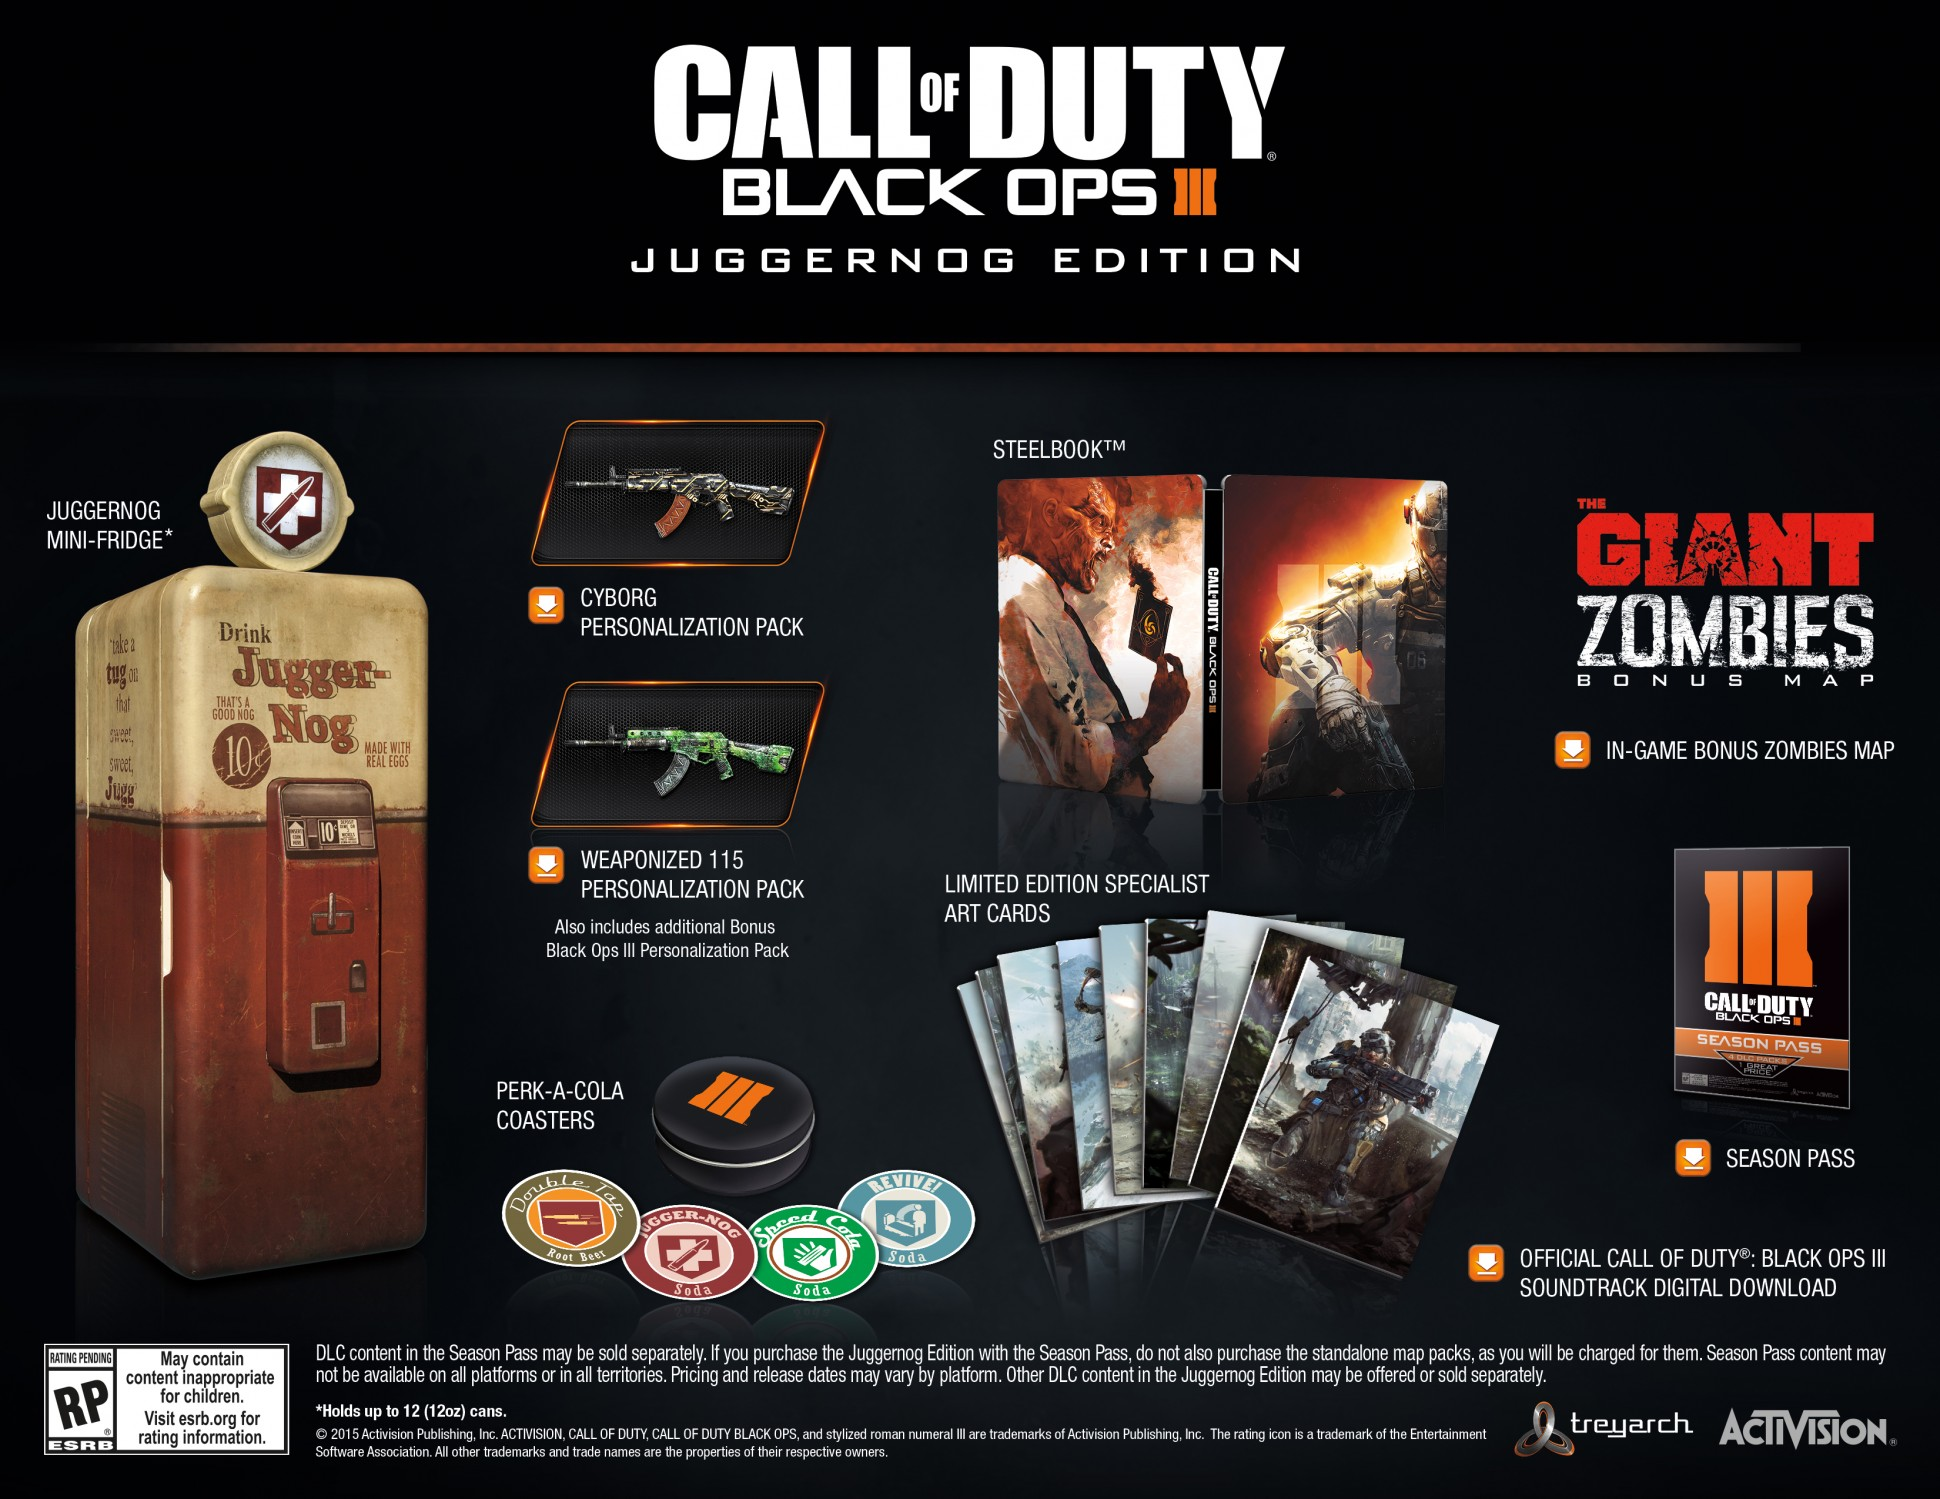 Call Of Duty Black Ops 3 Juggernog Edition Includes A Working Mini Fridge Xboxone Hq Com